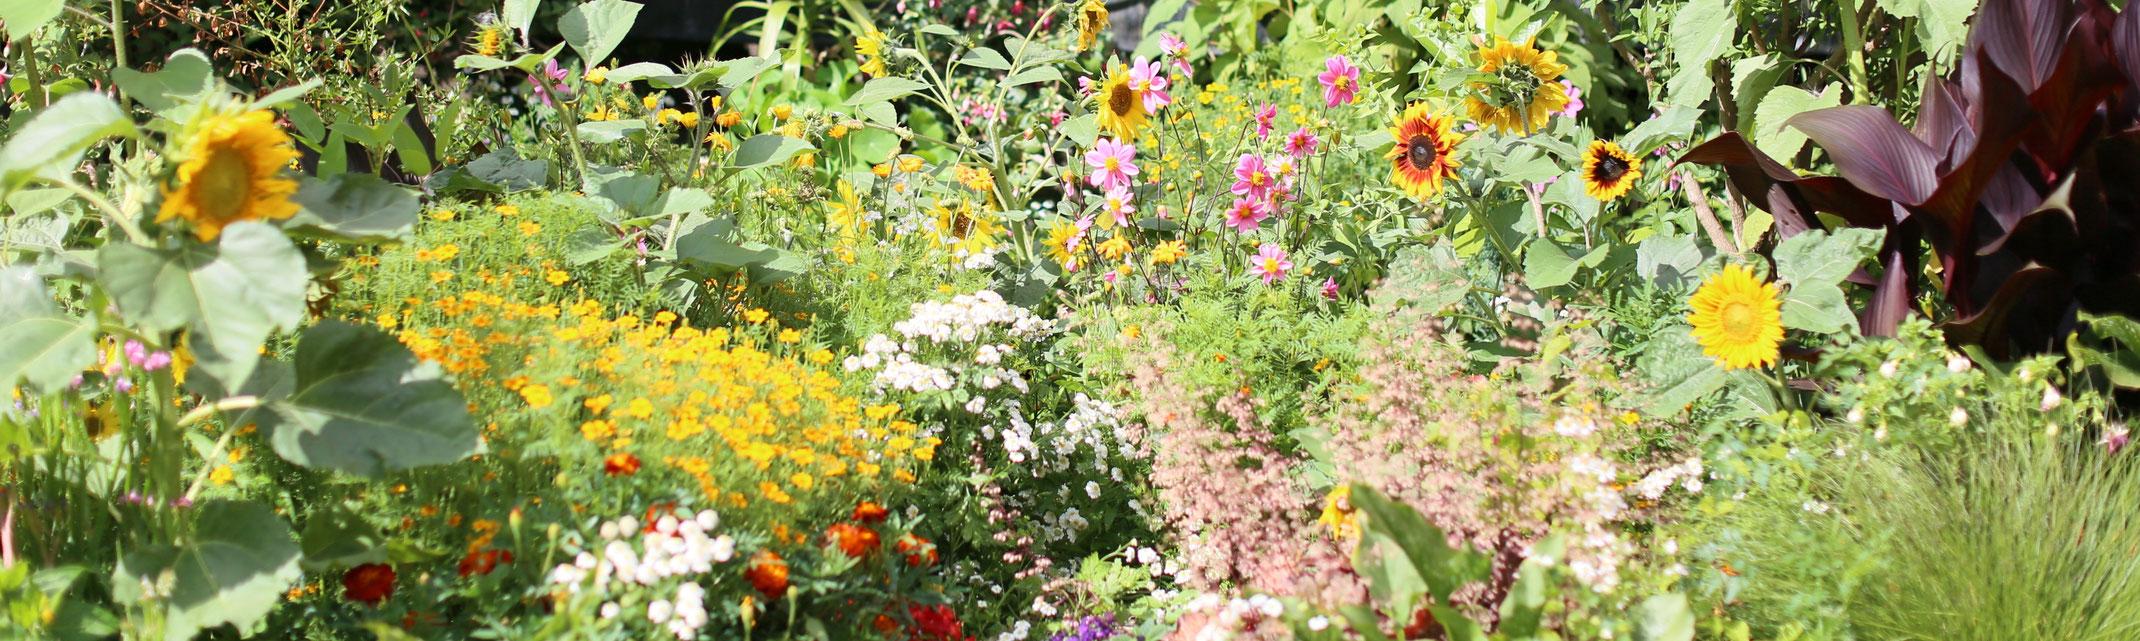 leistungen Natura Gartenbau